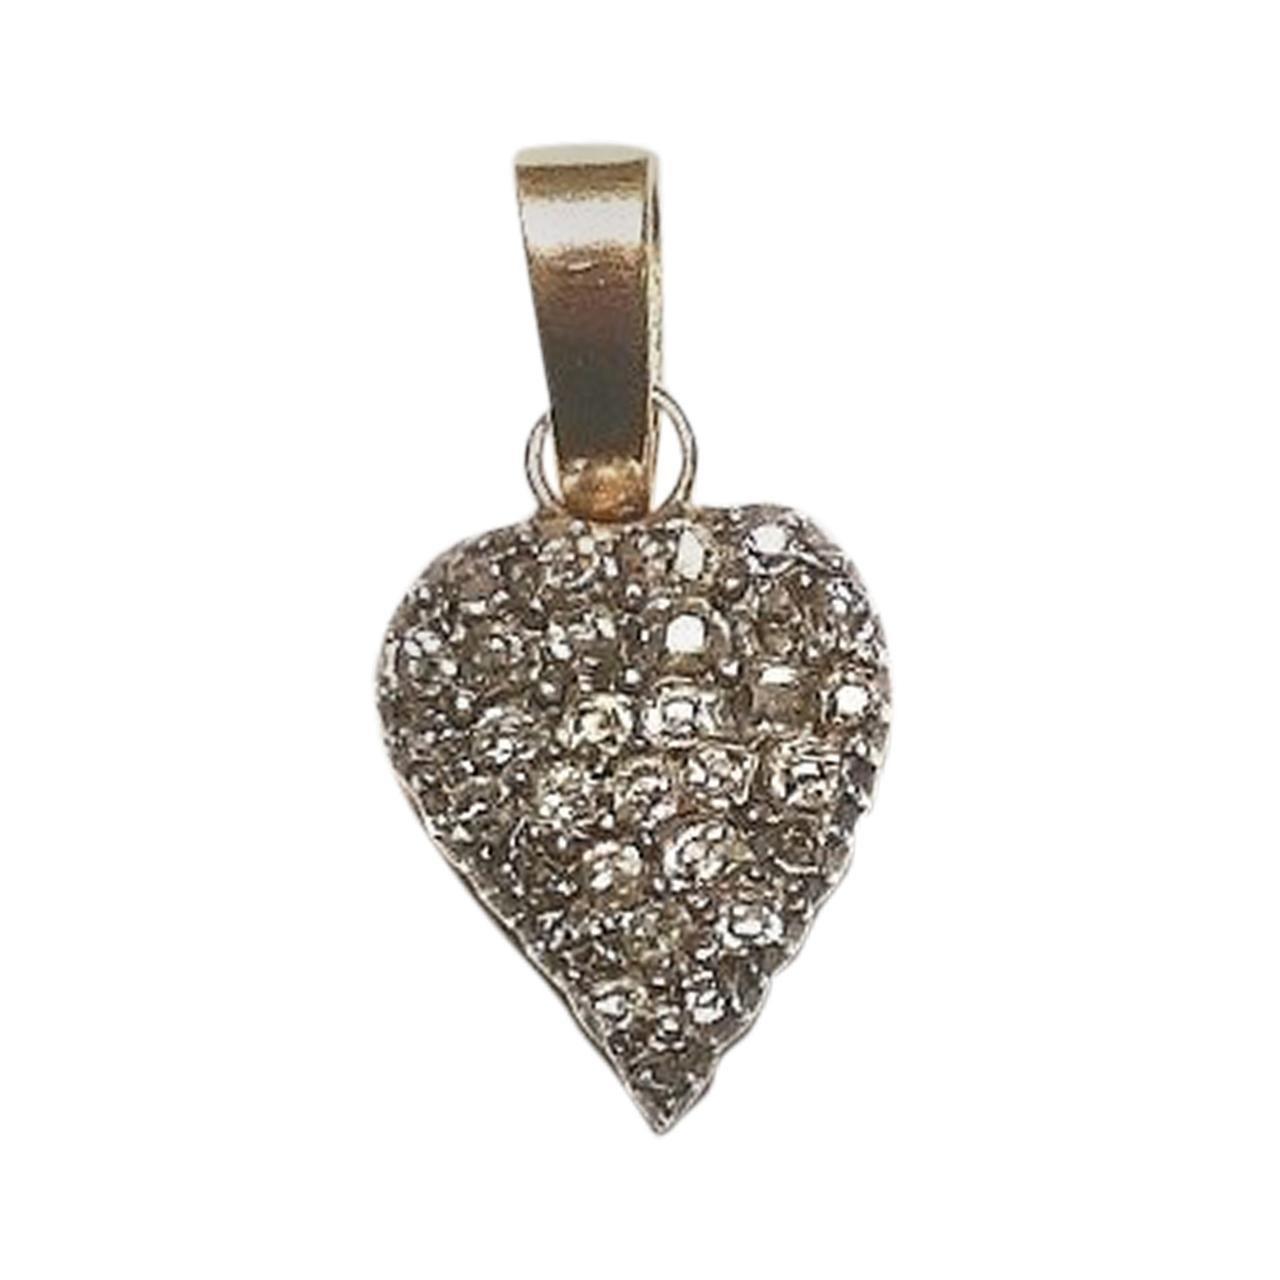 19th Century Gold and Diamonds Heart Pendant